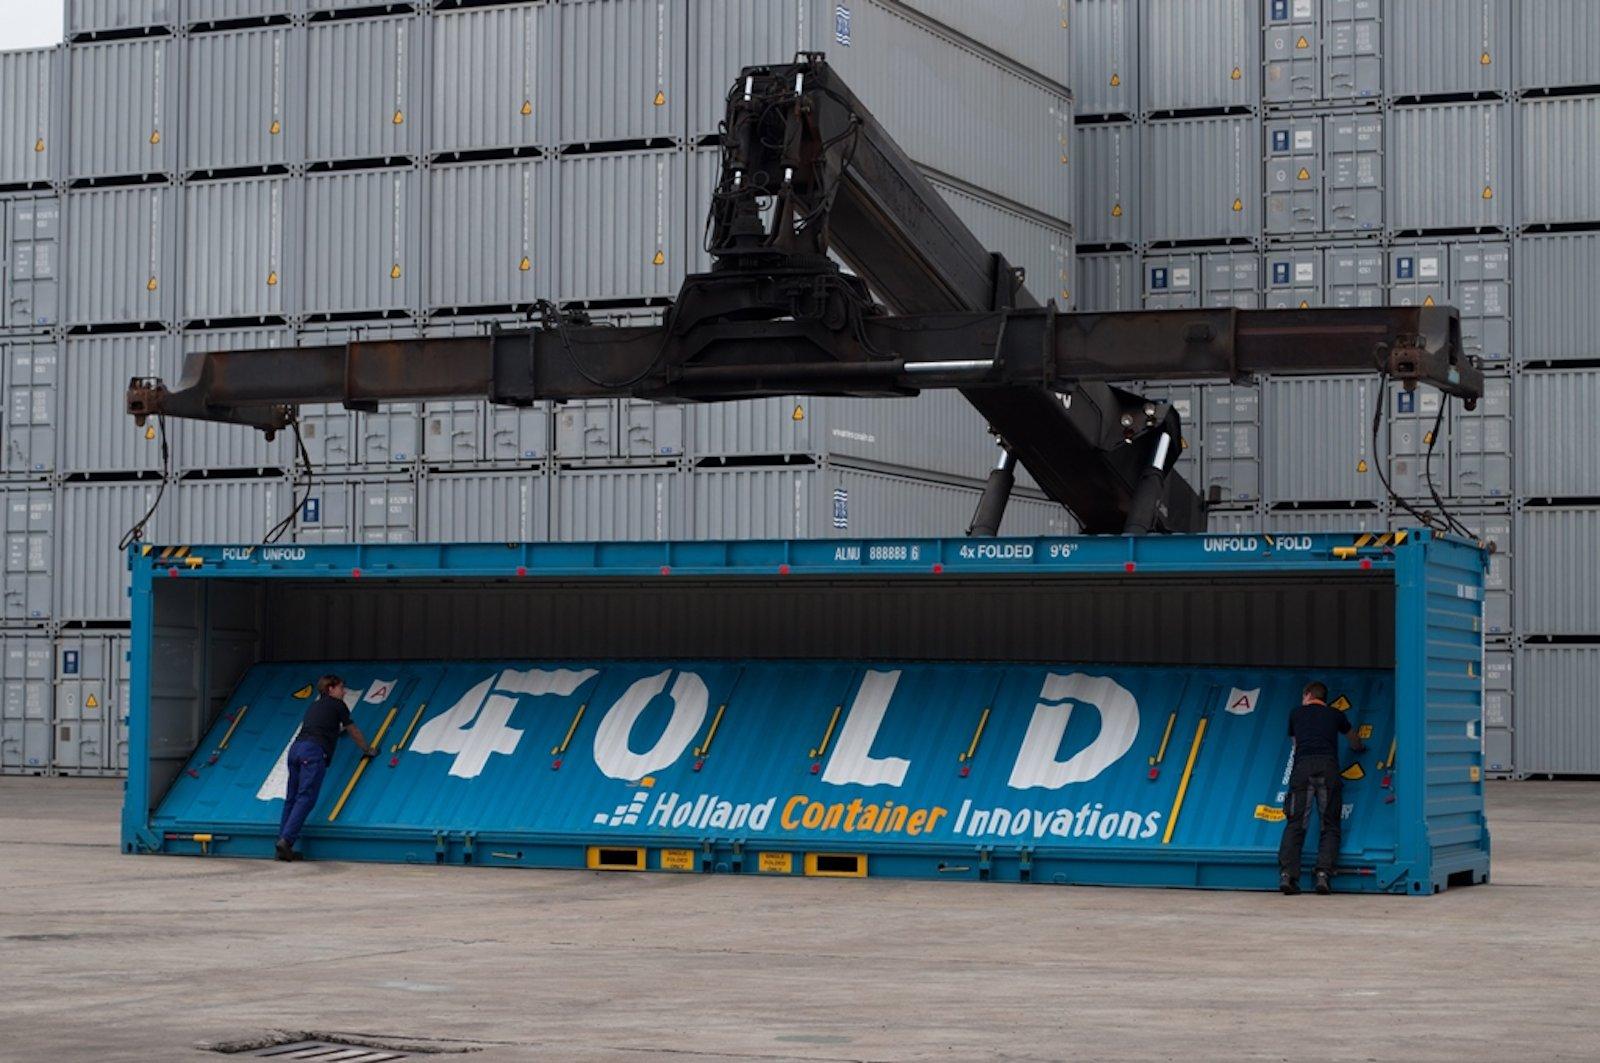 Having done HK-Rotterdam sea trials, foldable FEU tested in Europe